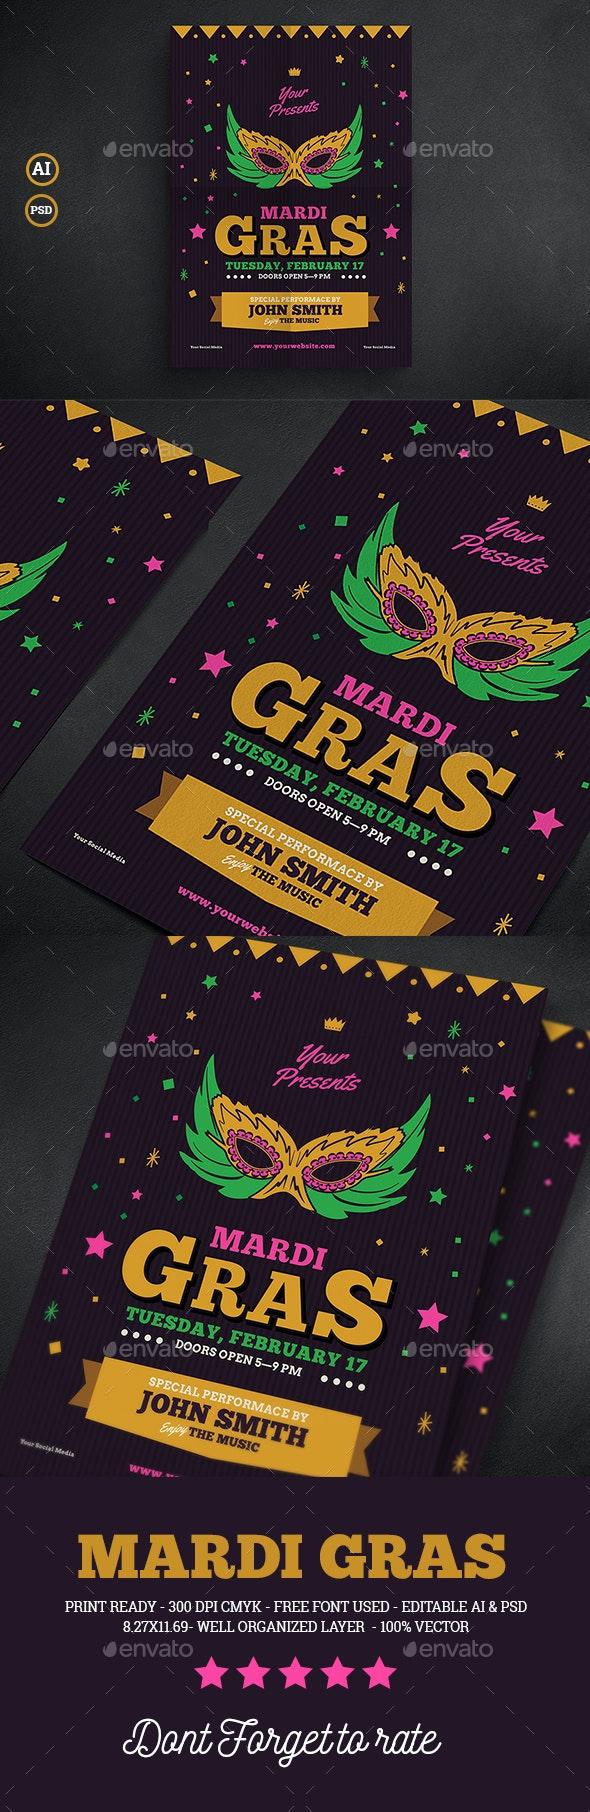 Mardi Gras Event Flyer - Events Flyers